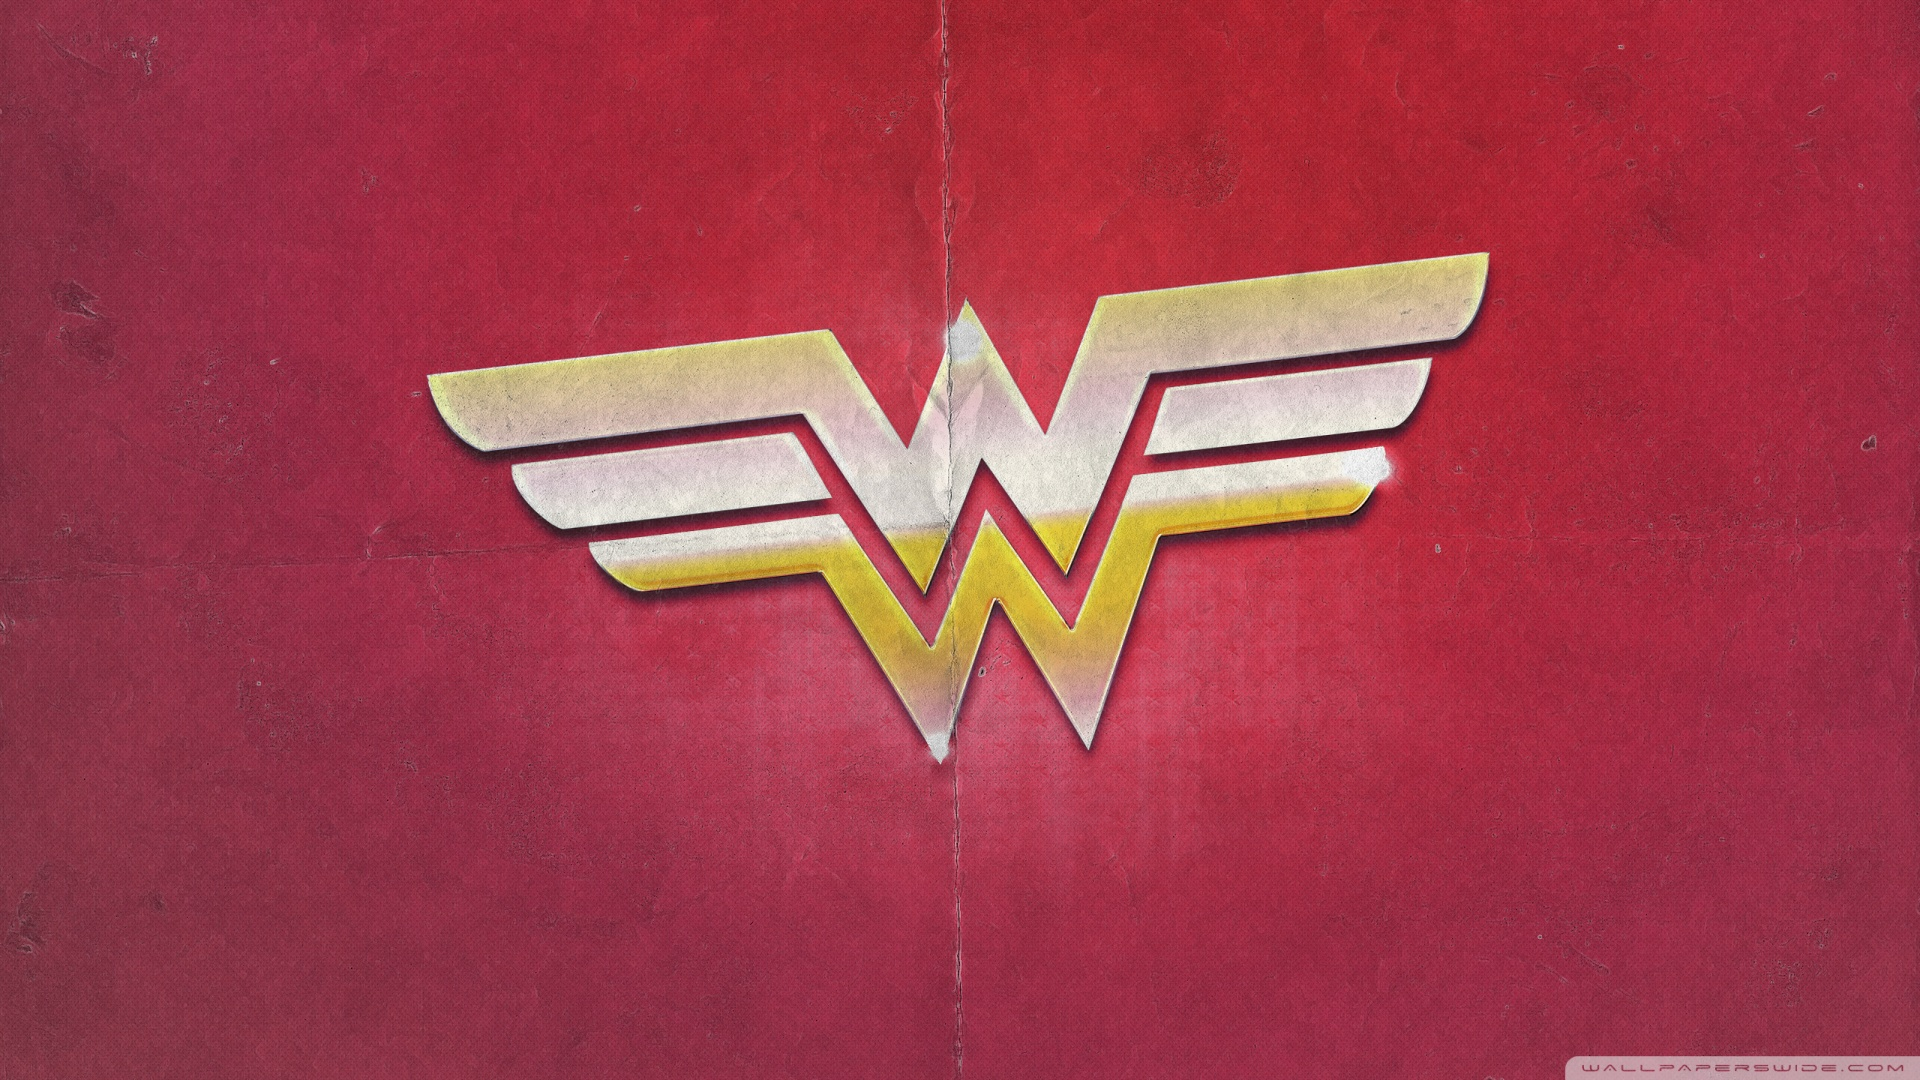 Wonder Woman Sign Wallpaper 1920x1080 Wonder Woman Sign 1920x1080